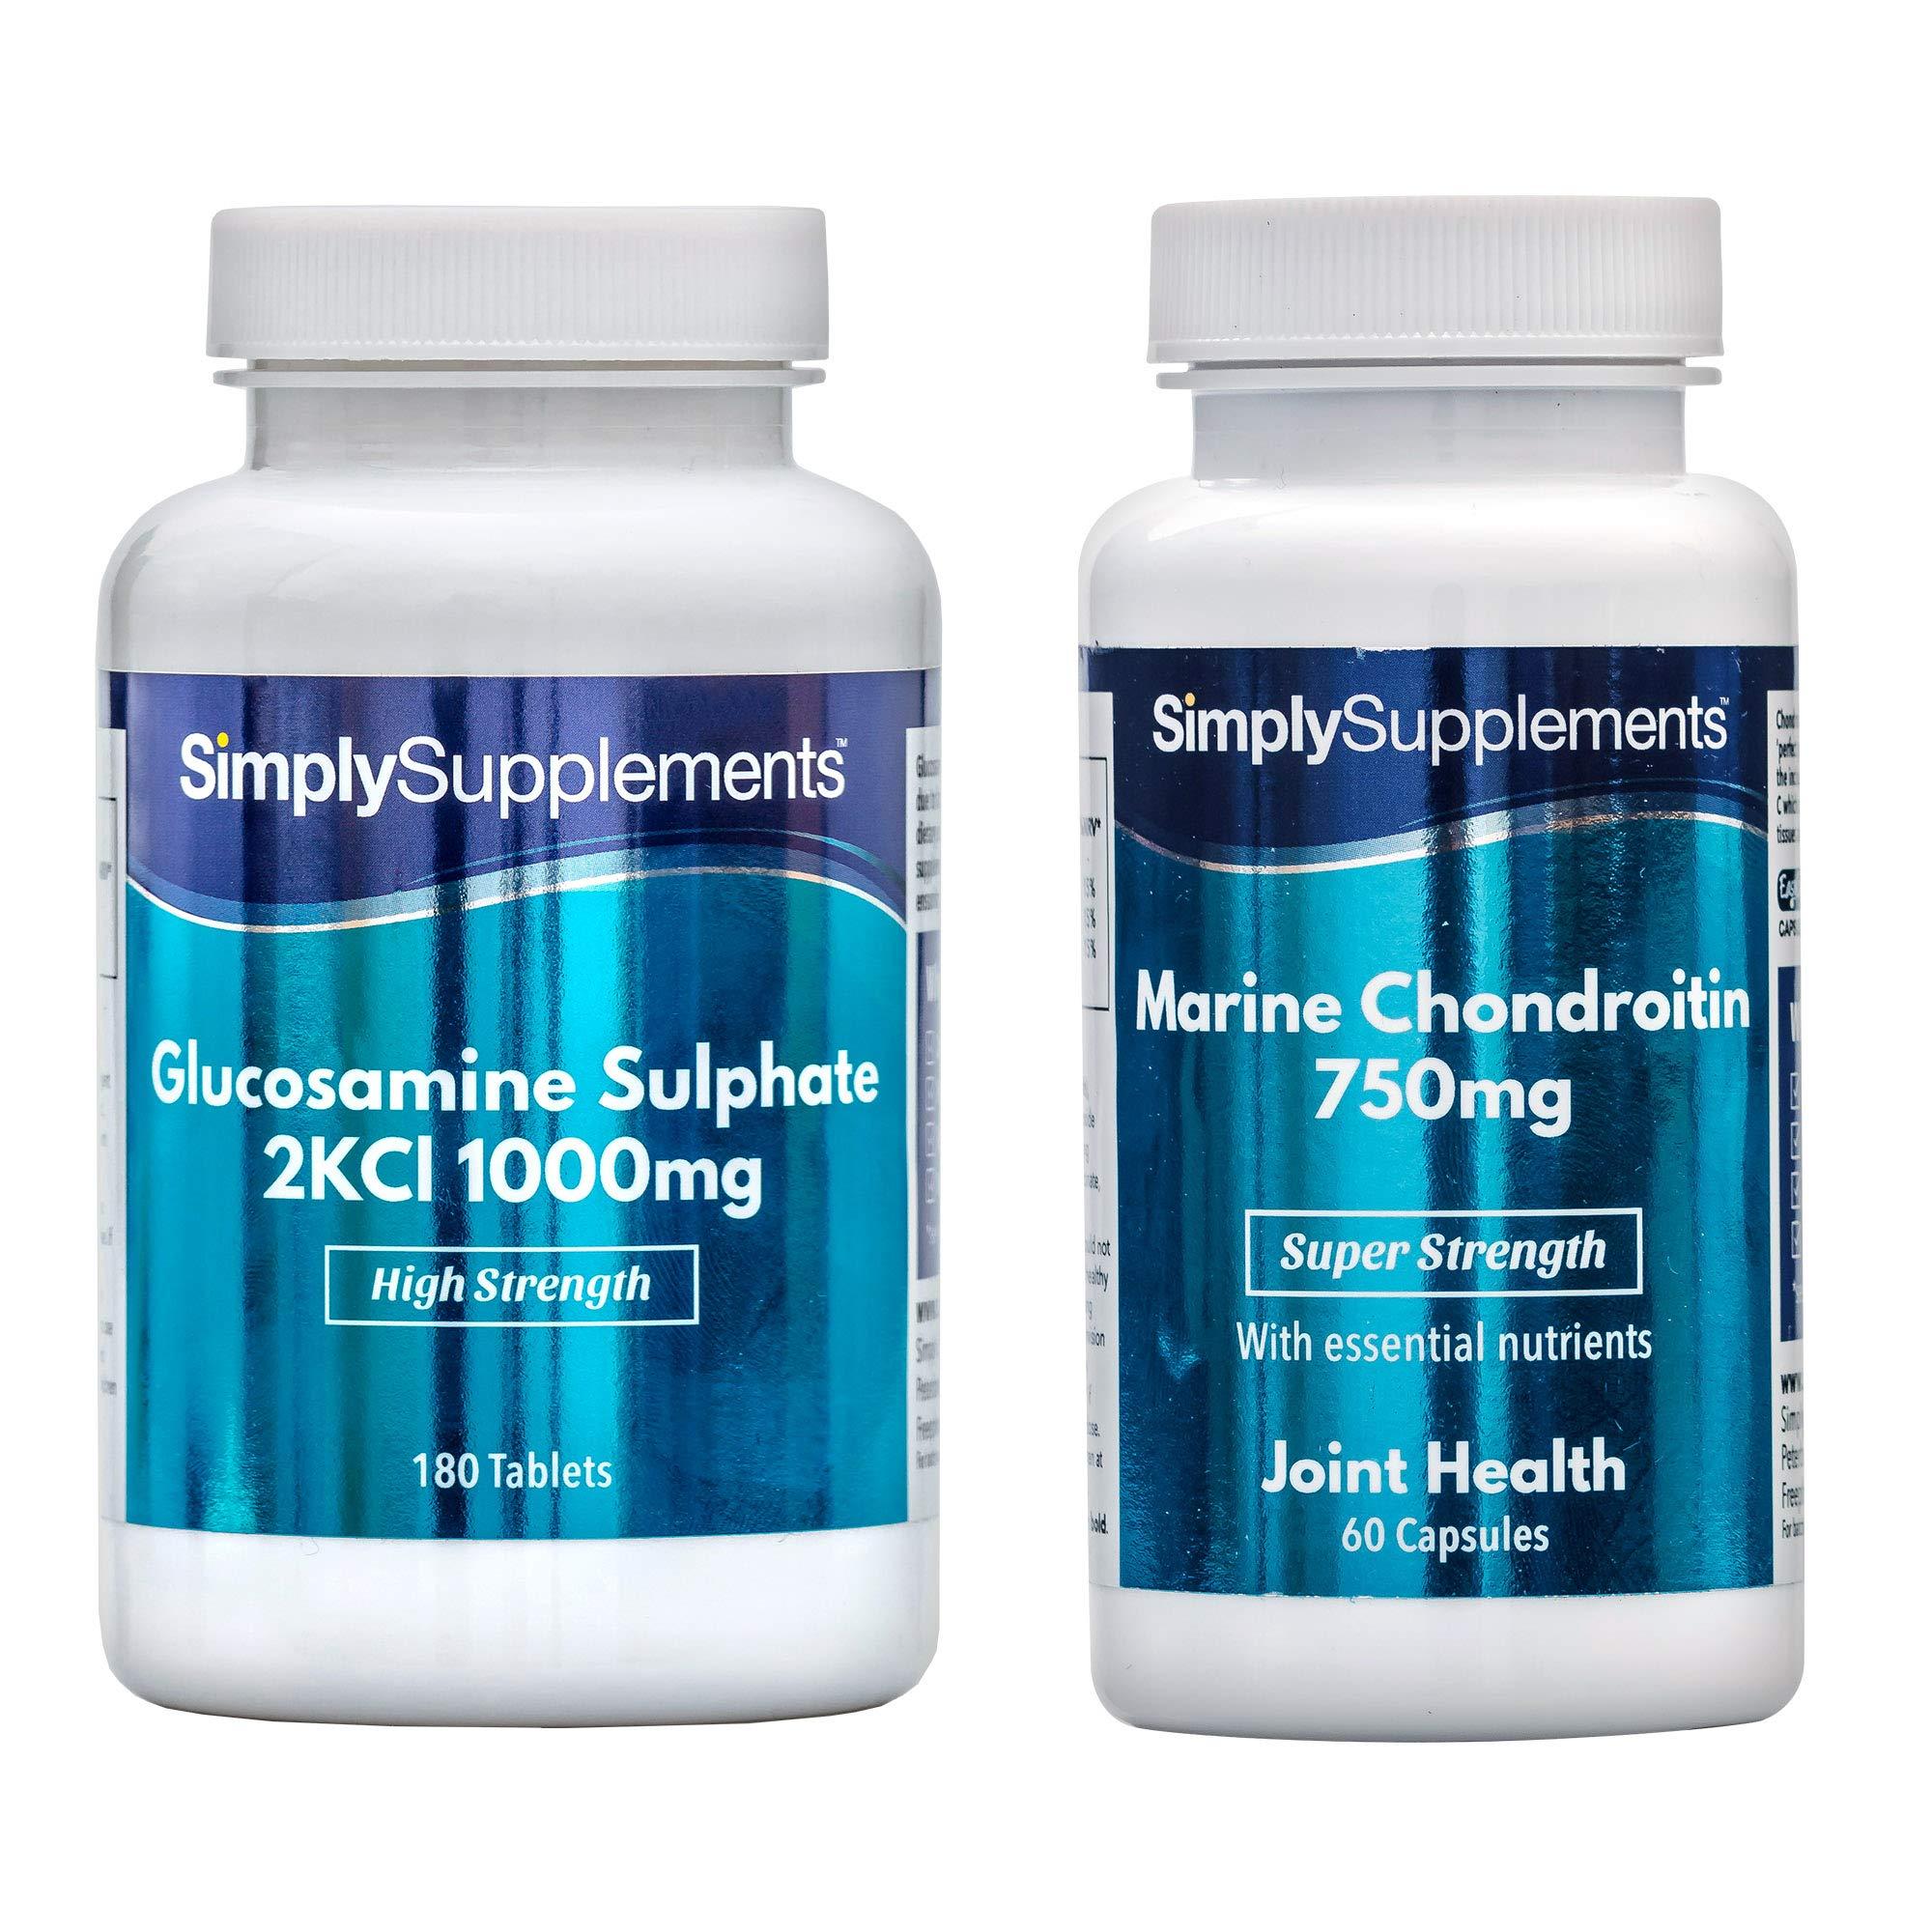 Glucosamine 1000mg & Marine Chondroitin 750mg